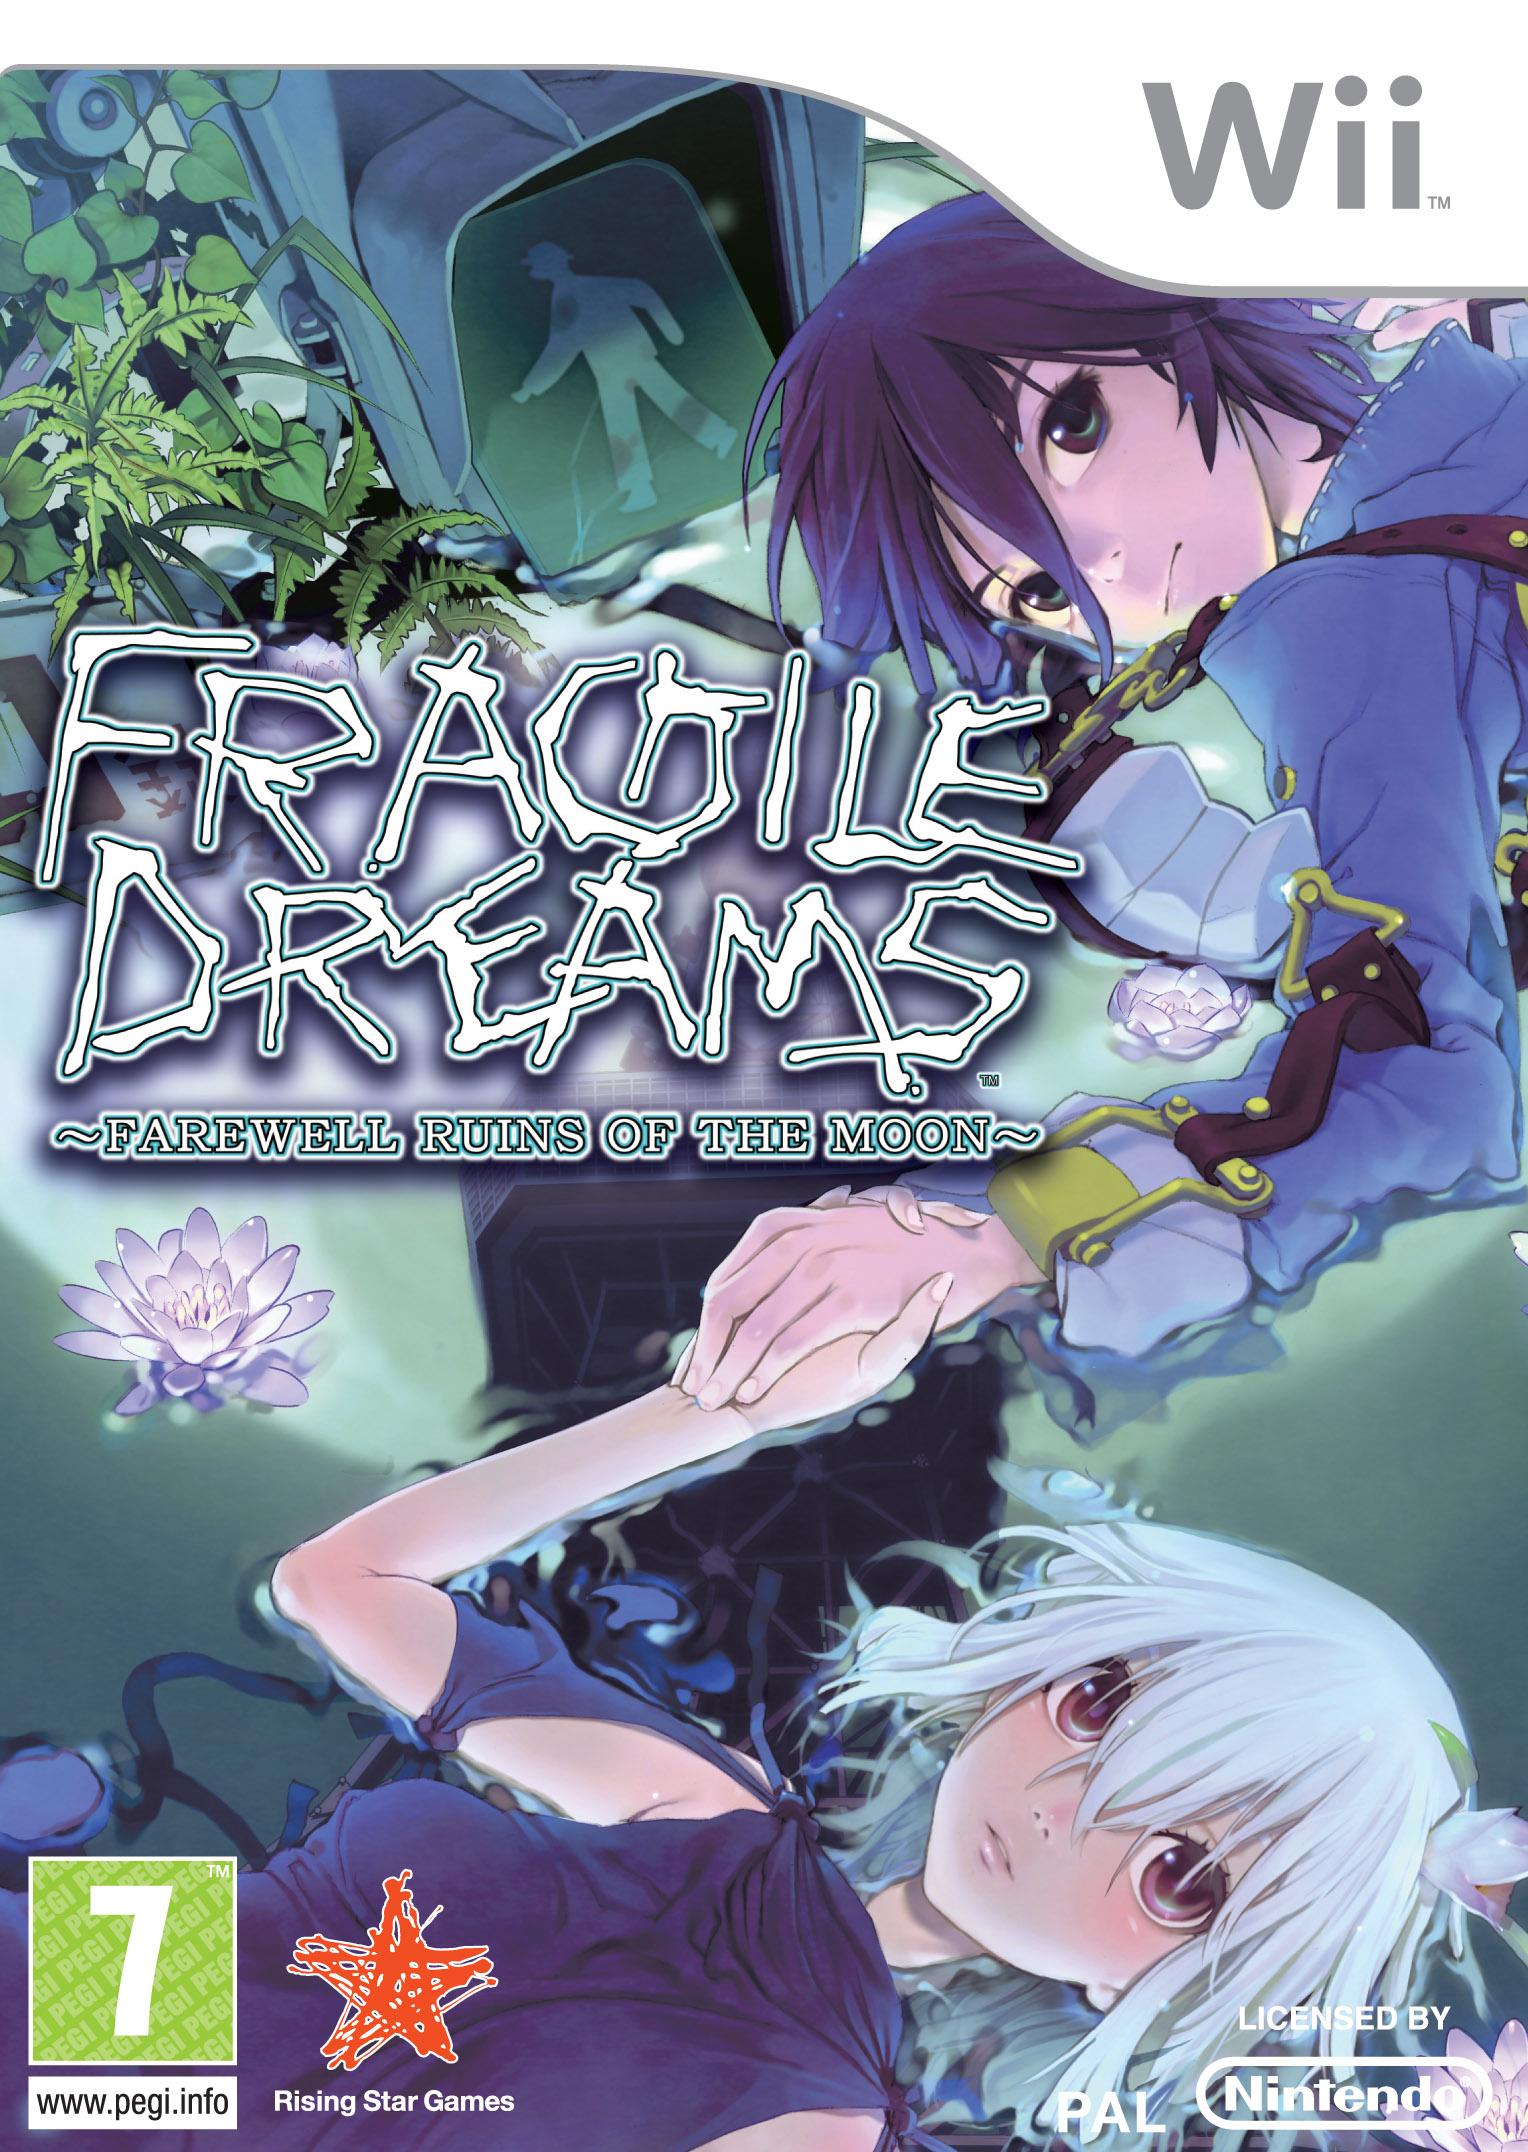 Fragile Wii Jaquette002